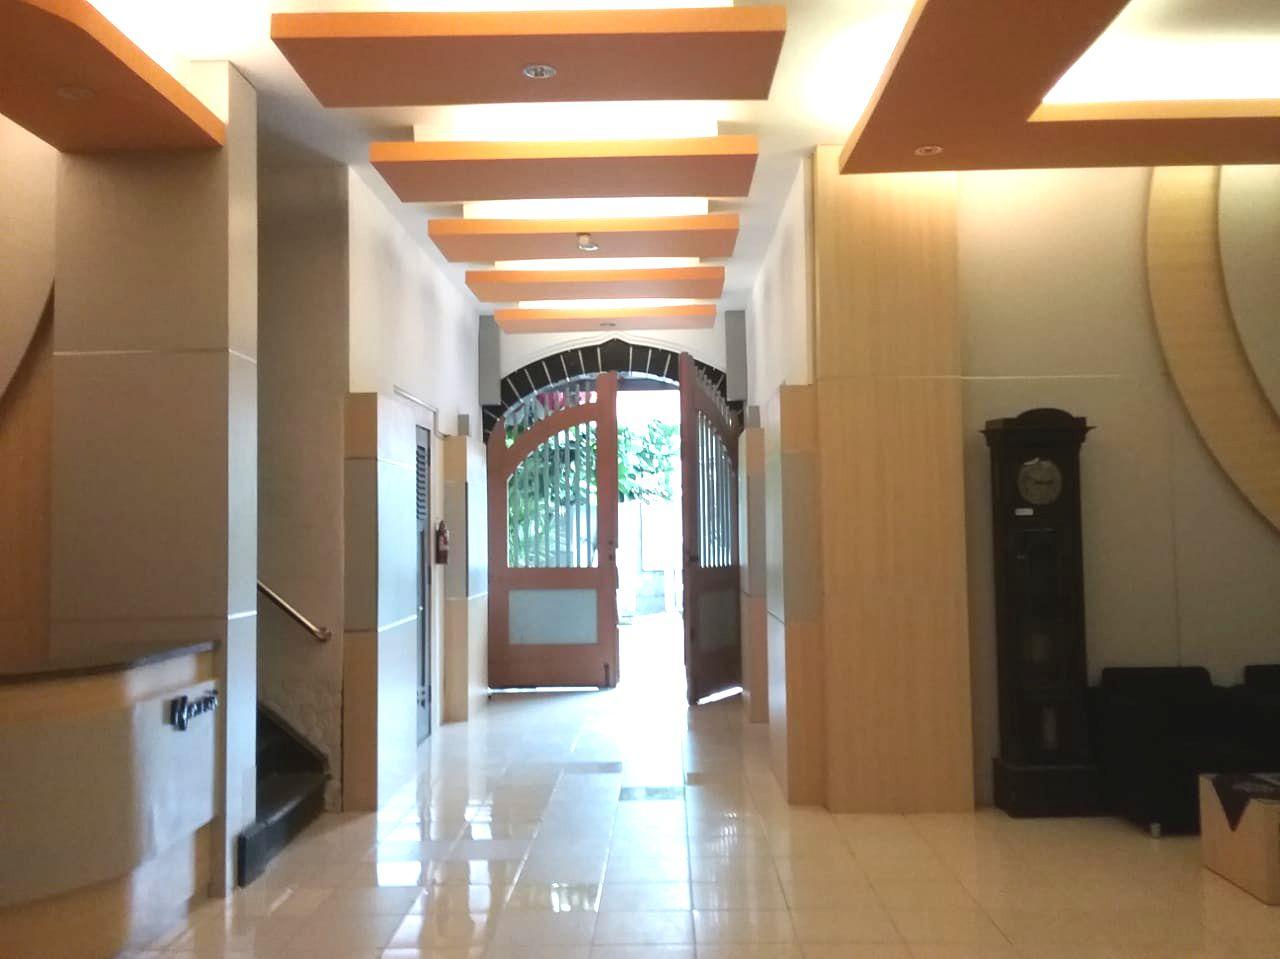 SMKN 20 Yogyakarta   Lead you to the brightness   Page 205